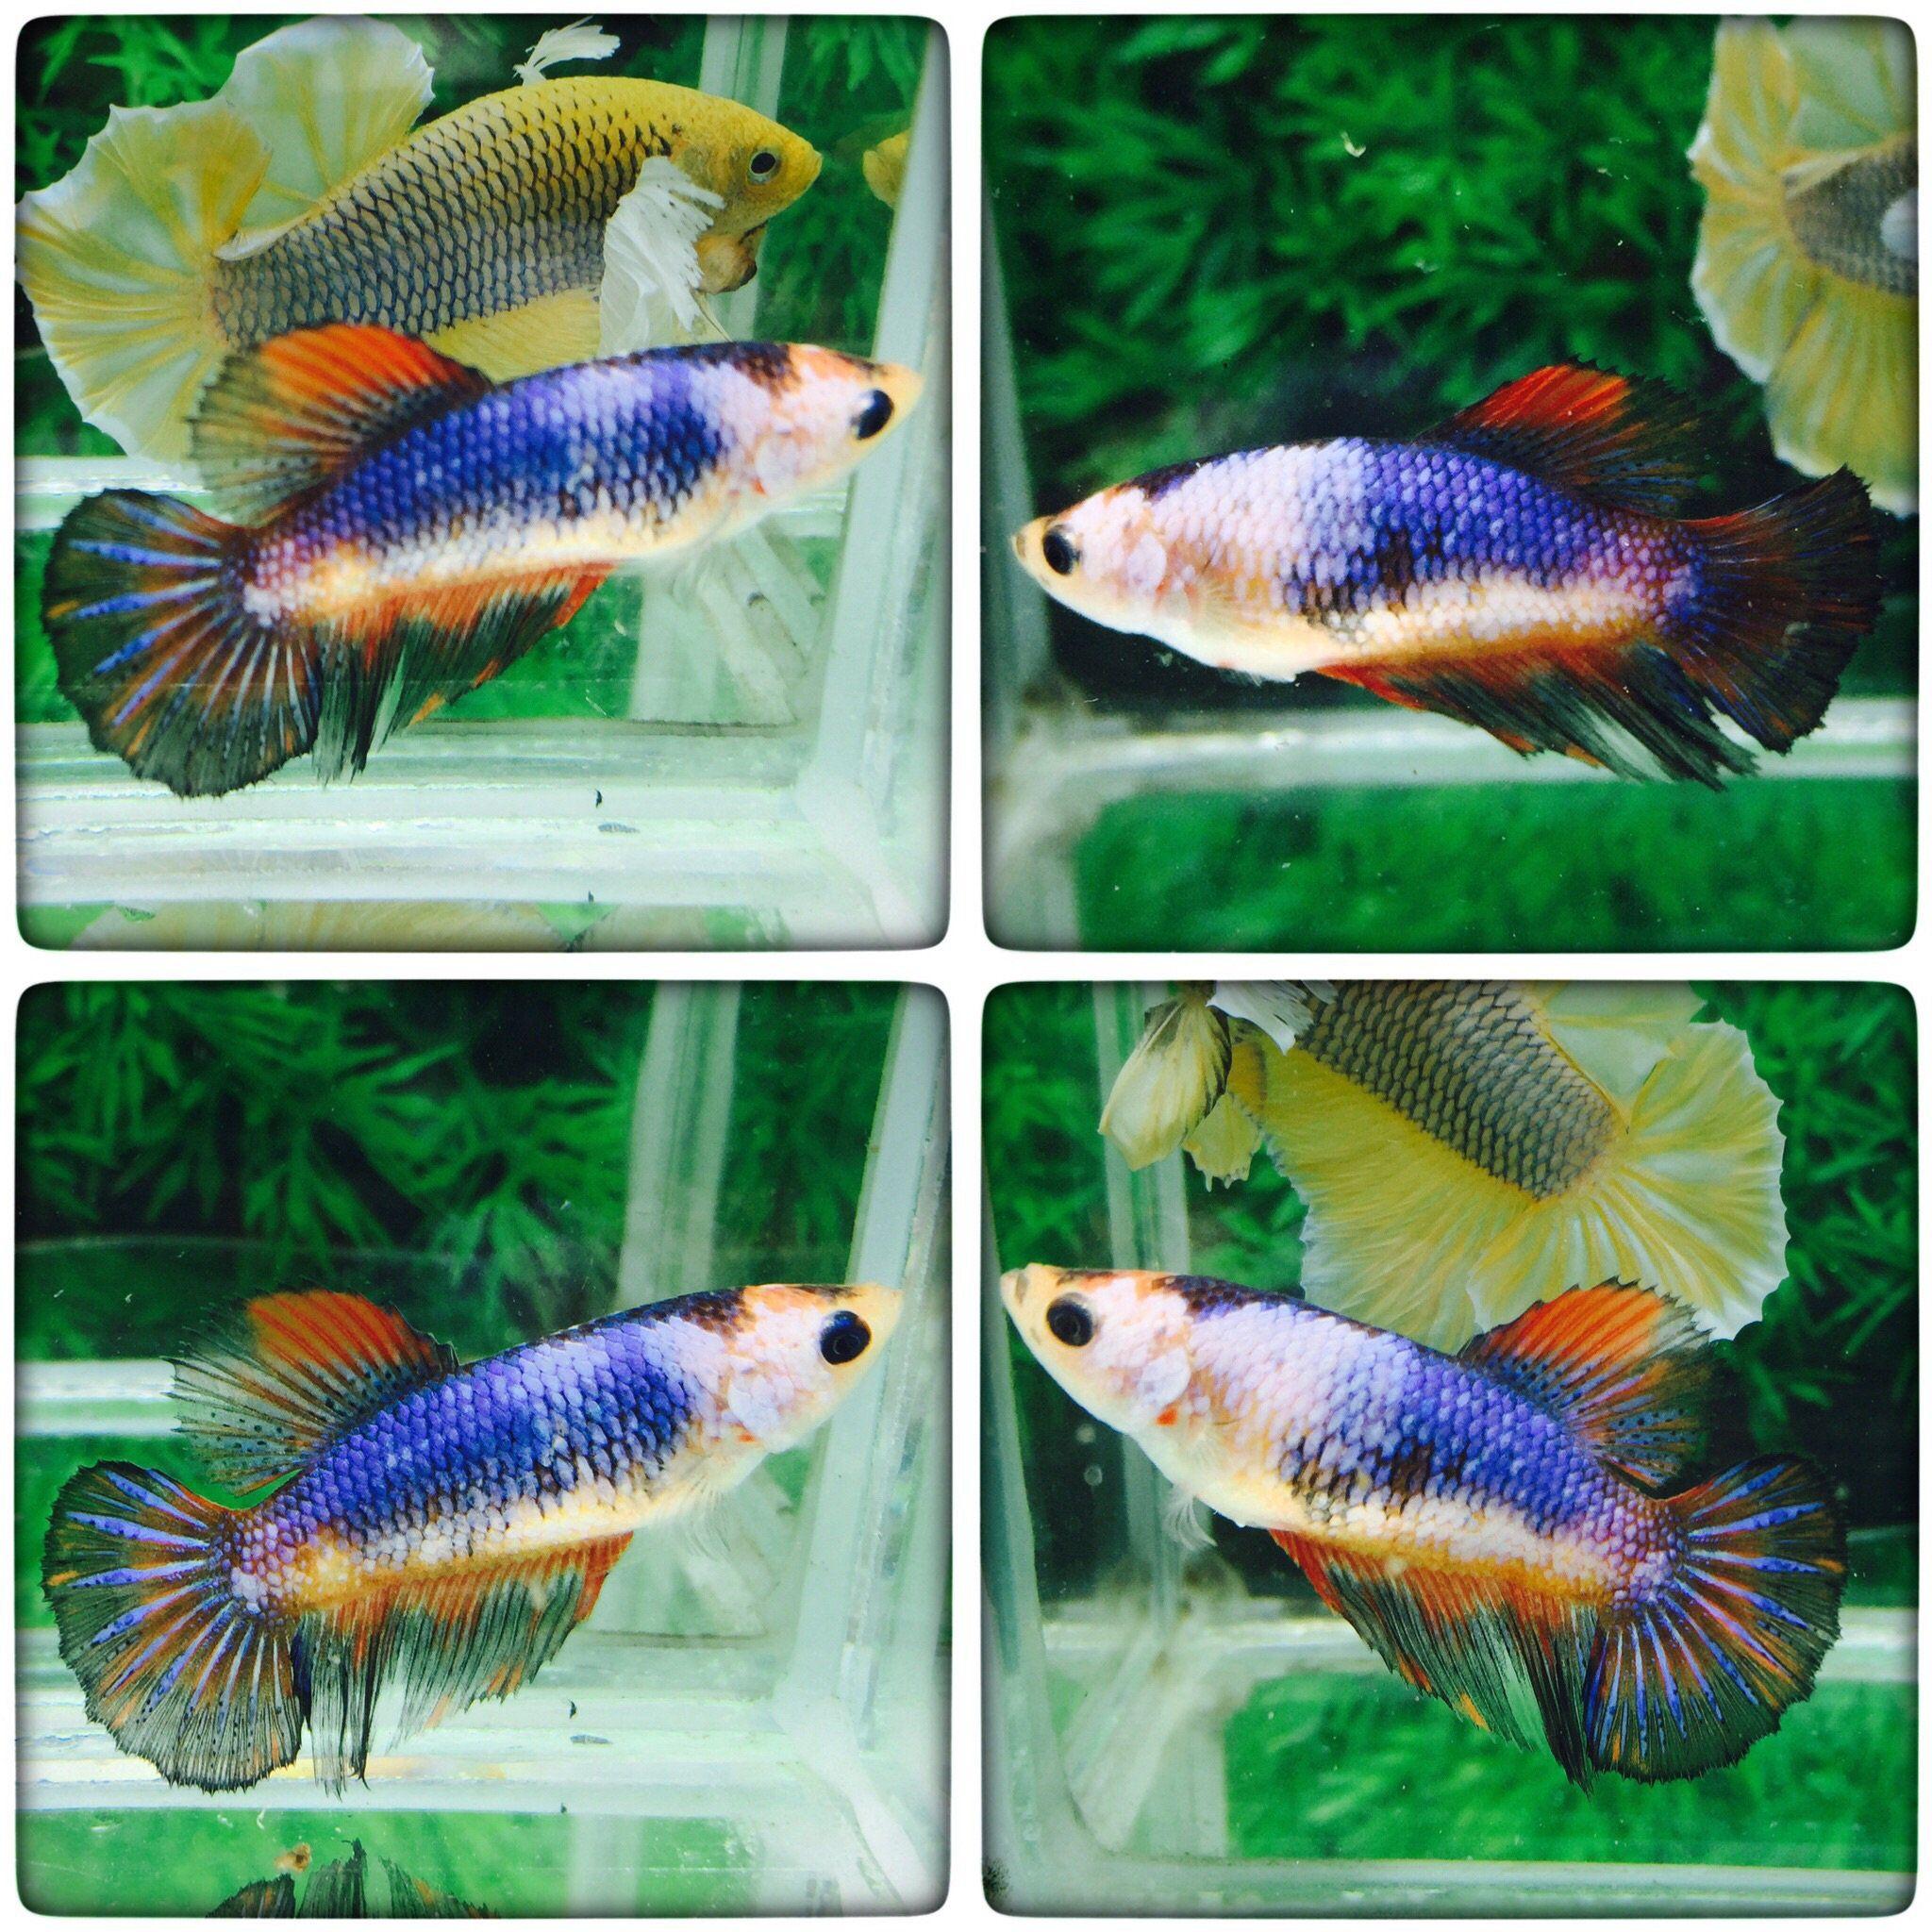 fwbettashm1483884007 - +++Blue black and orange-HM-Female+++ ...